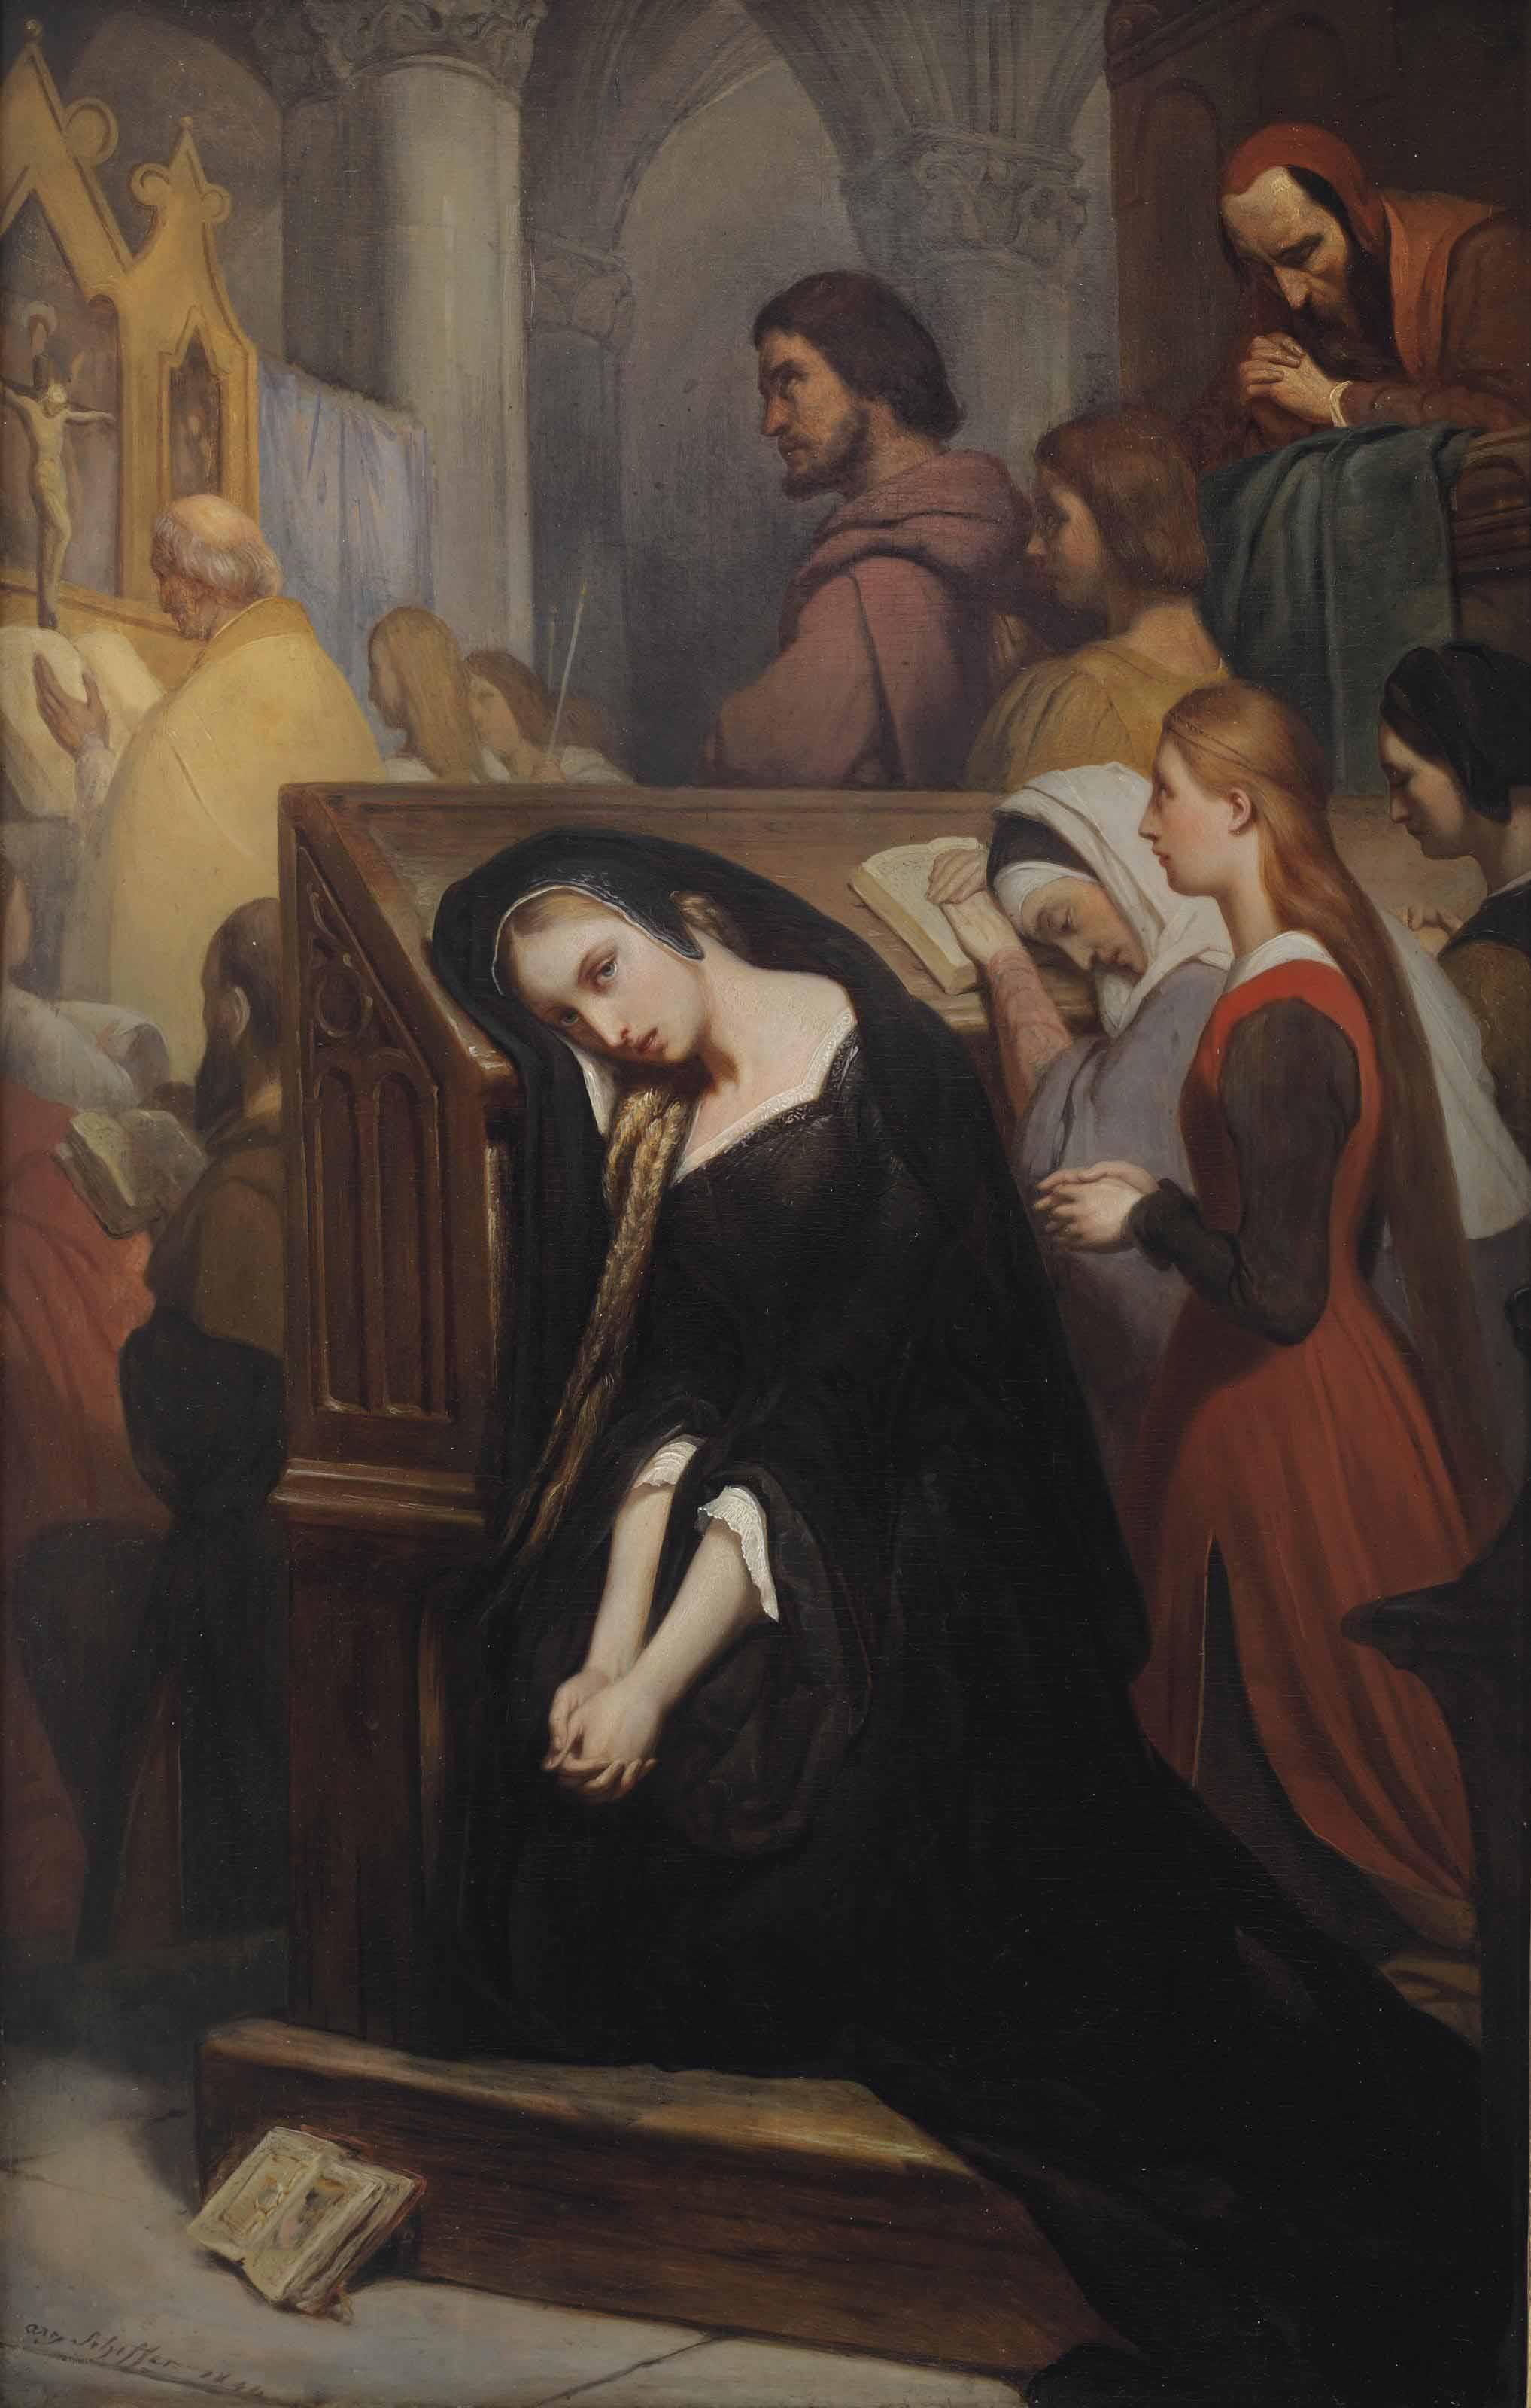 Marguerite in the church